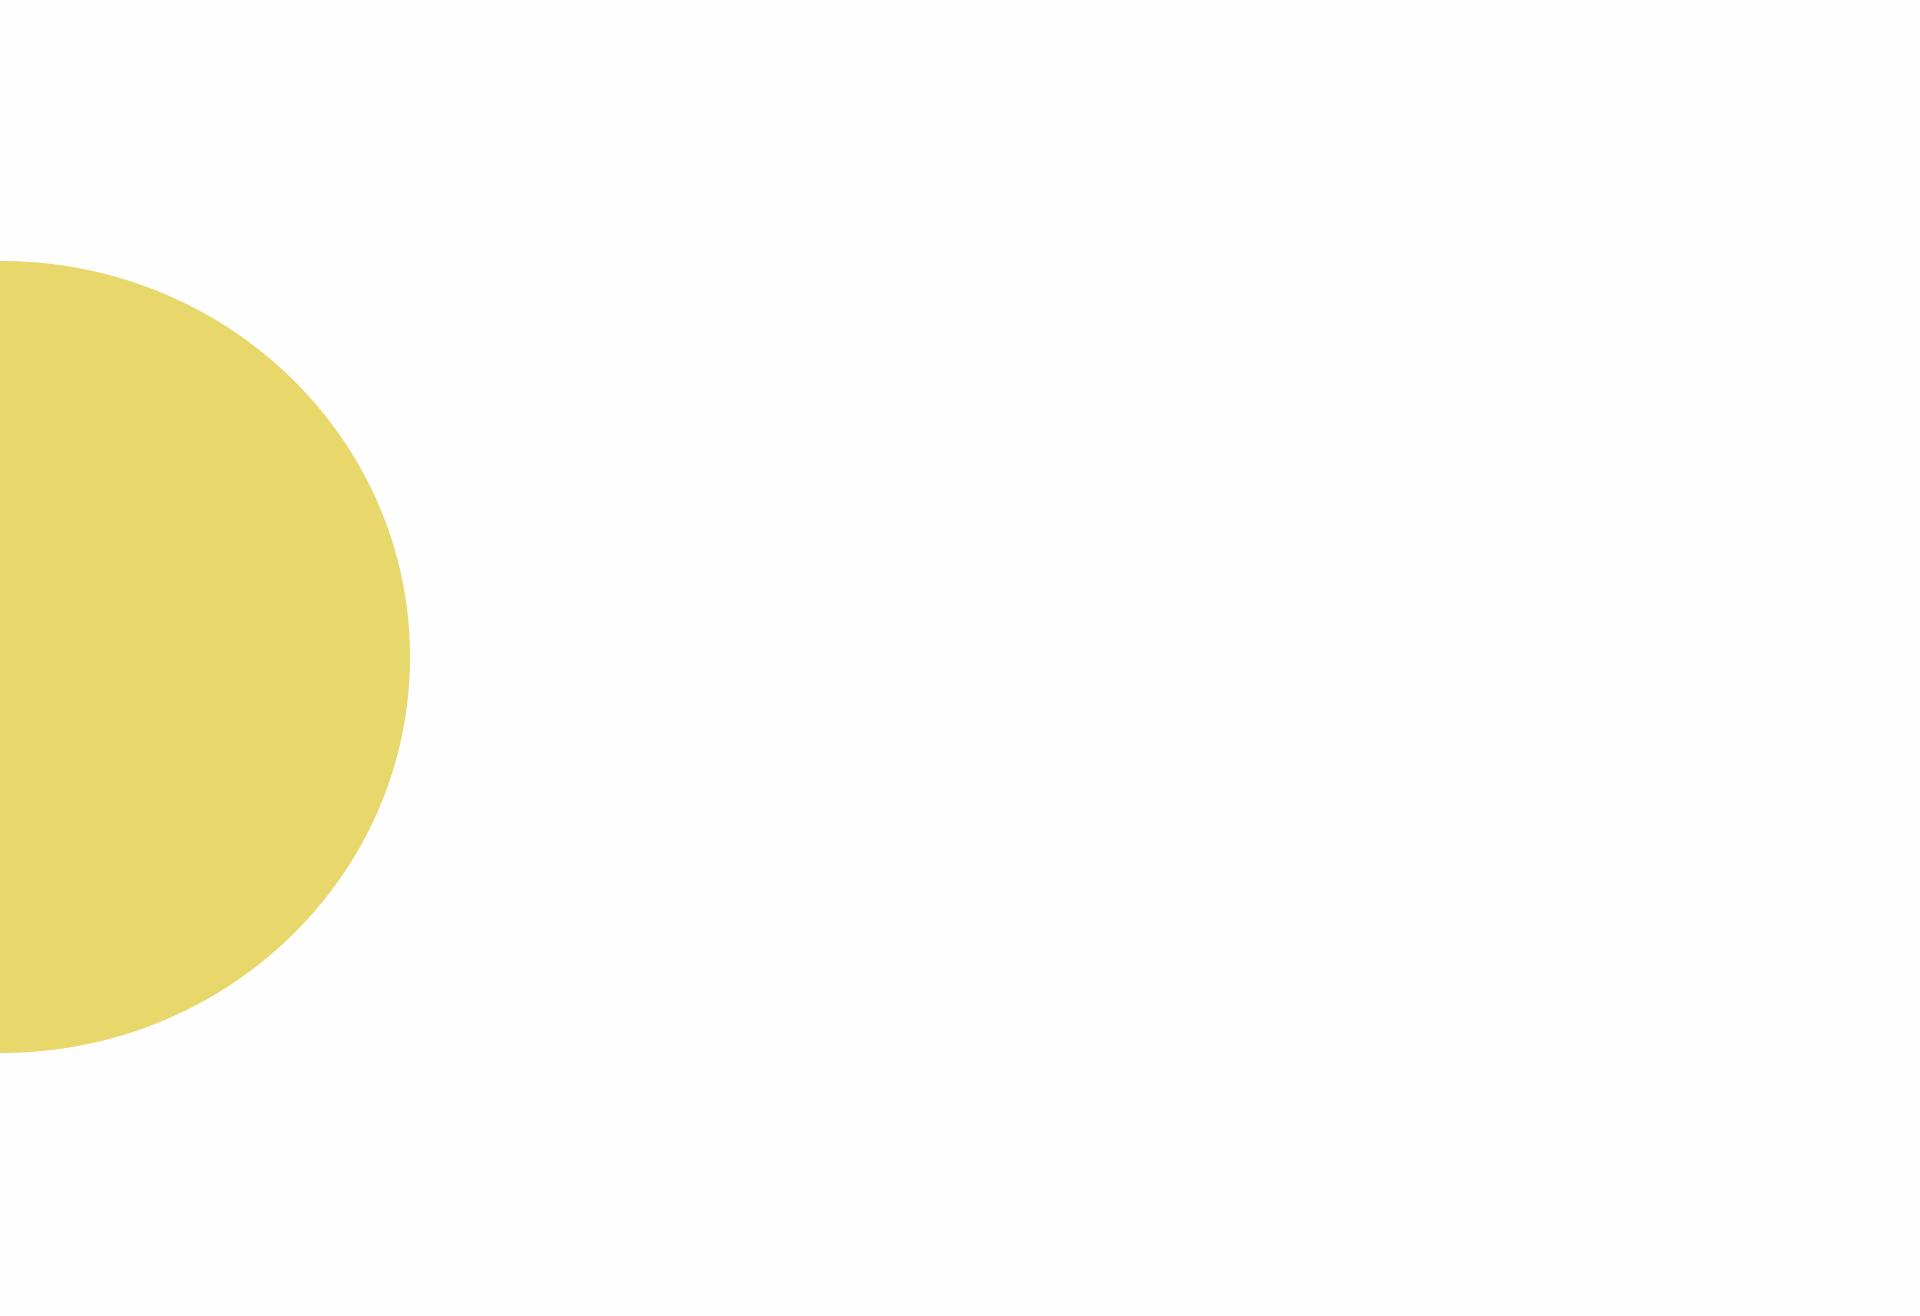 gl (4.3.1)